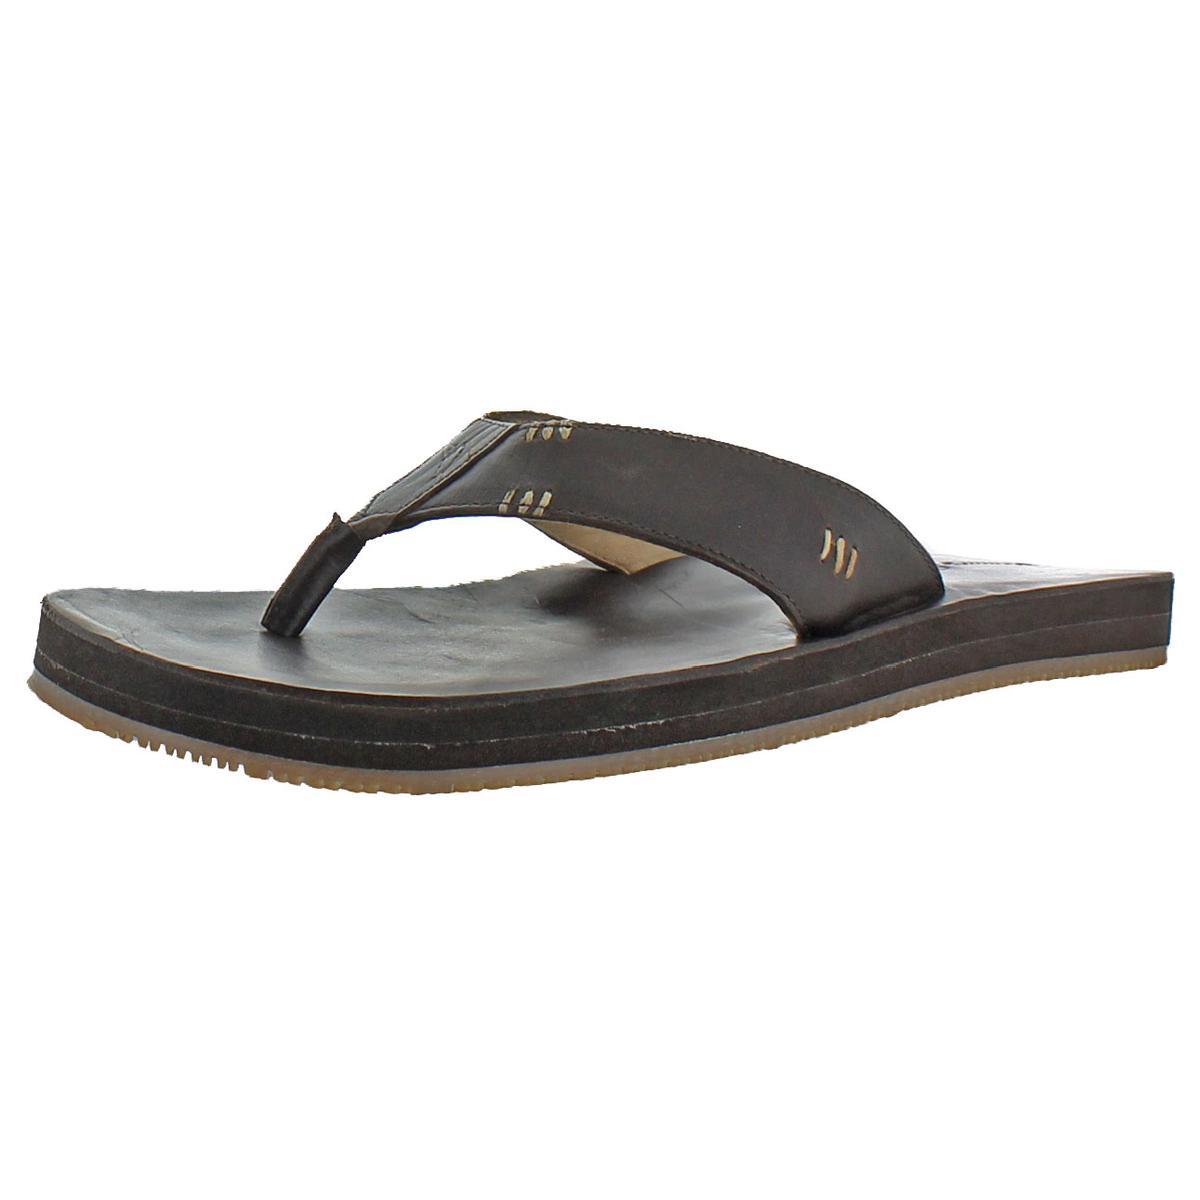 ce10a8ec92c07c Tommy Bahama Mens Adderly Summer Flip Flops Thongs Flip-Flops ...